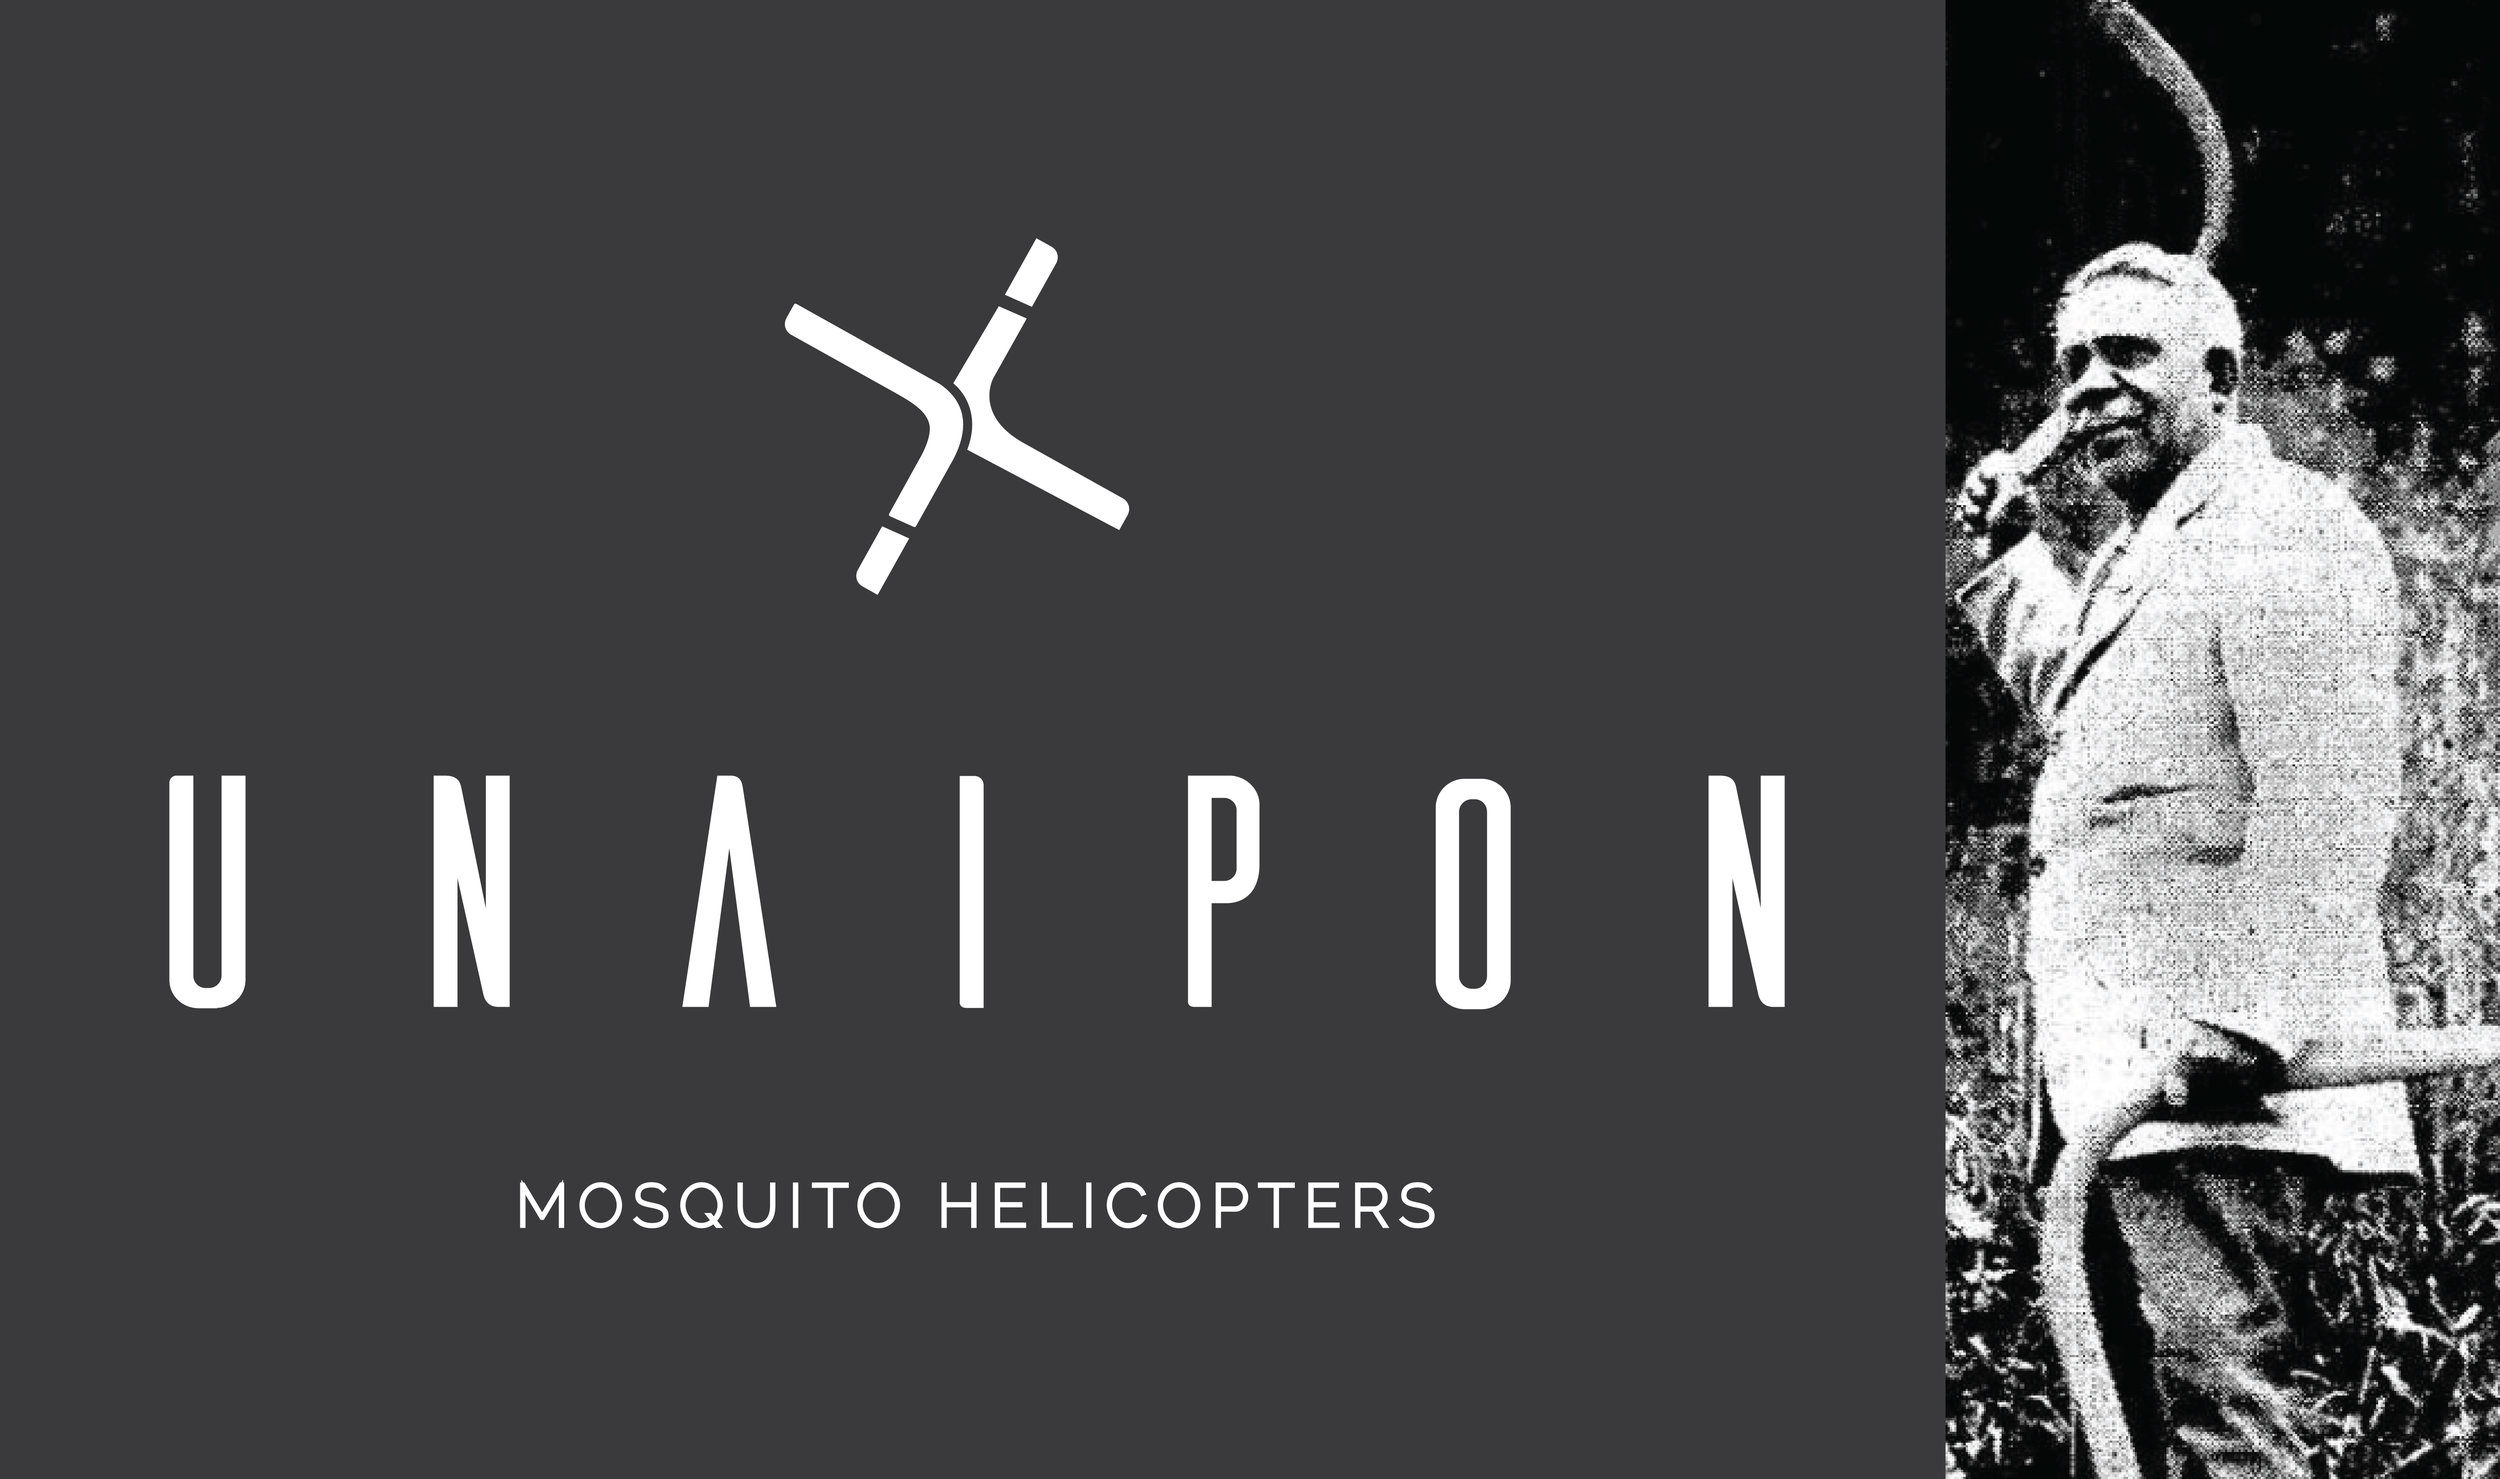 Unaipon Helicopter logo and David Unaipon holding two of his Boomerangs